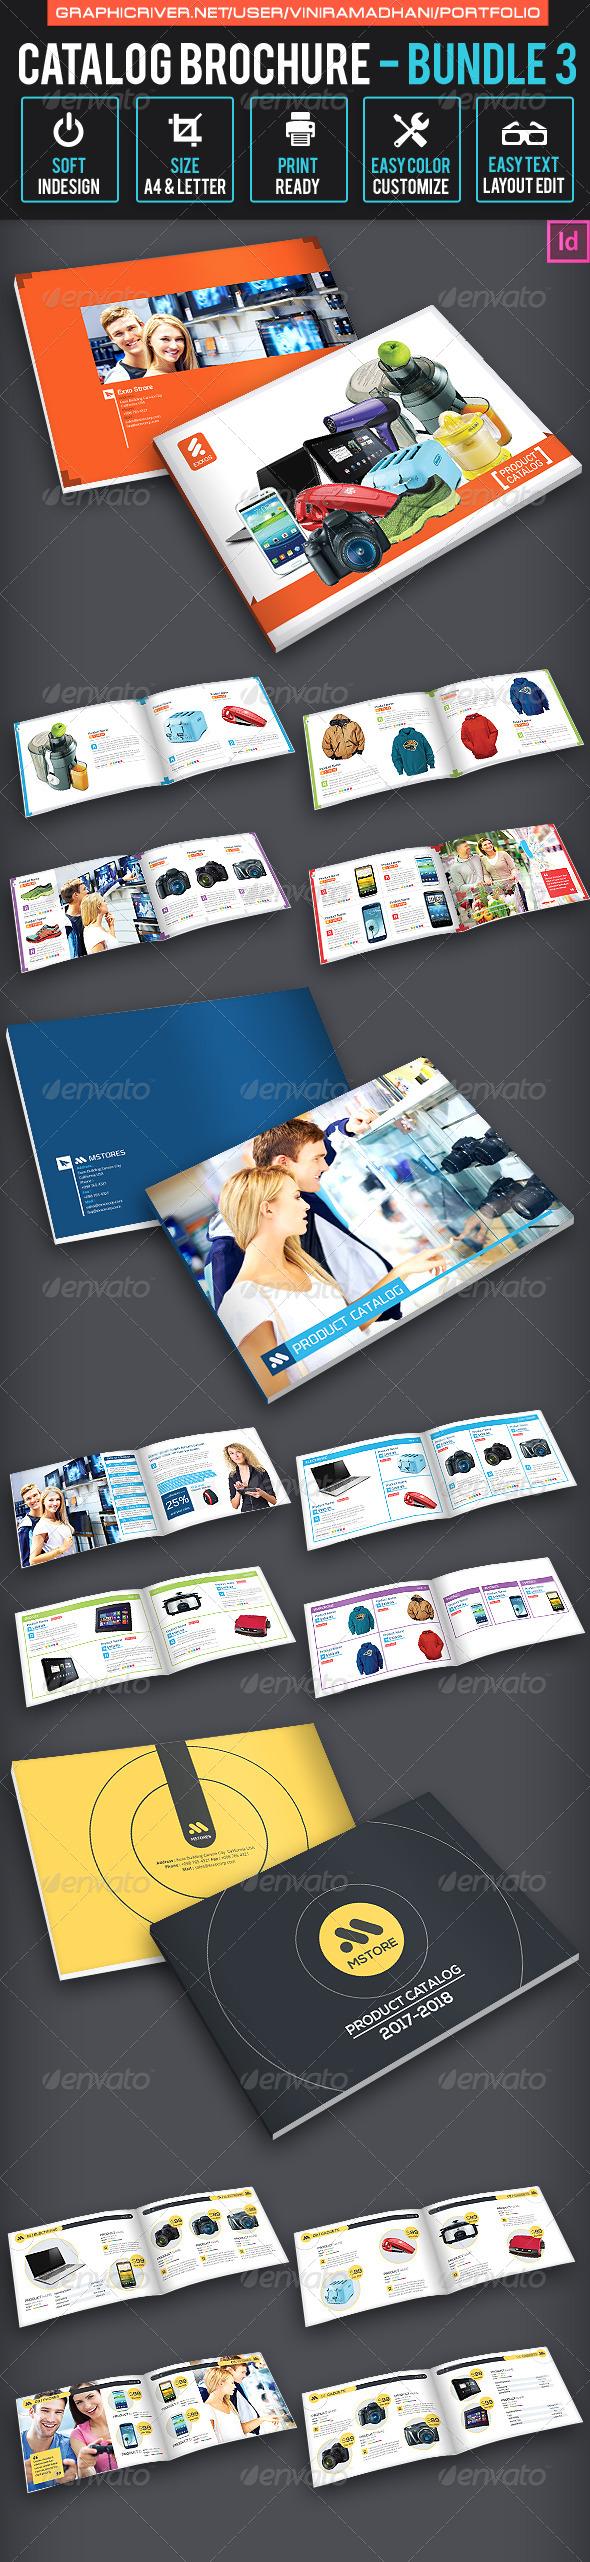 Catalog Brochure bundle 3 - Catalogs Brochures